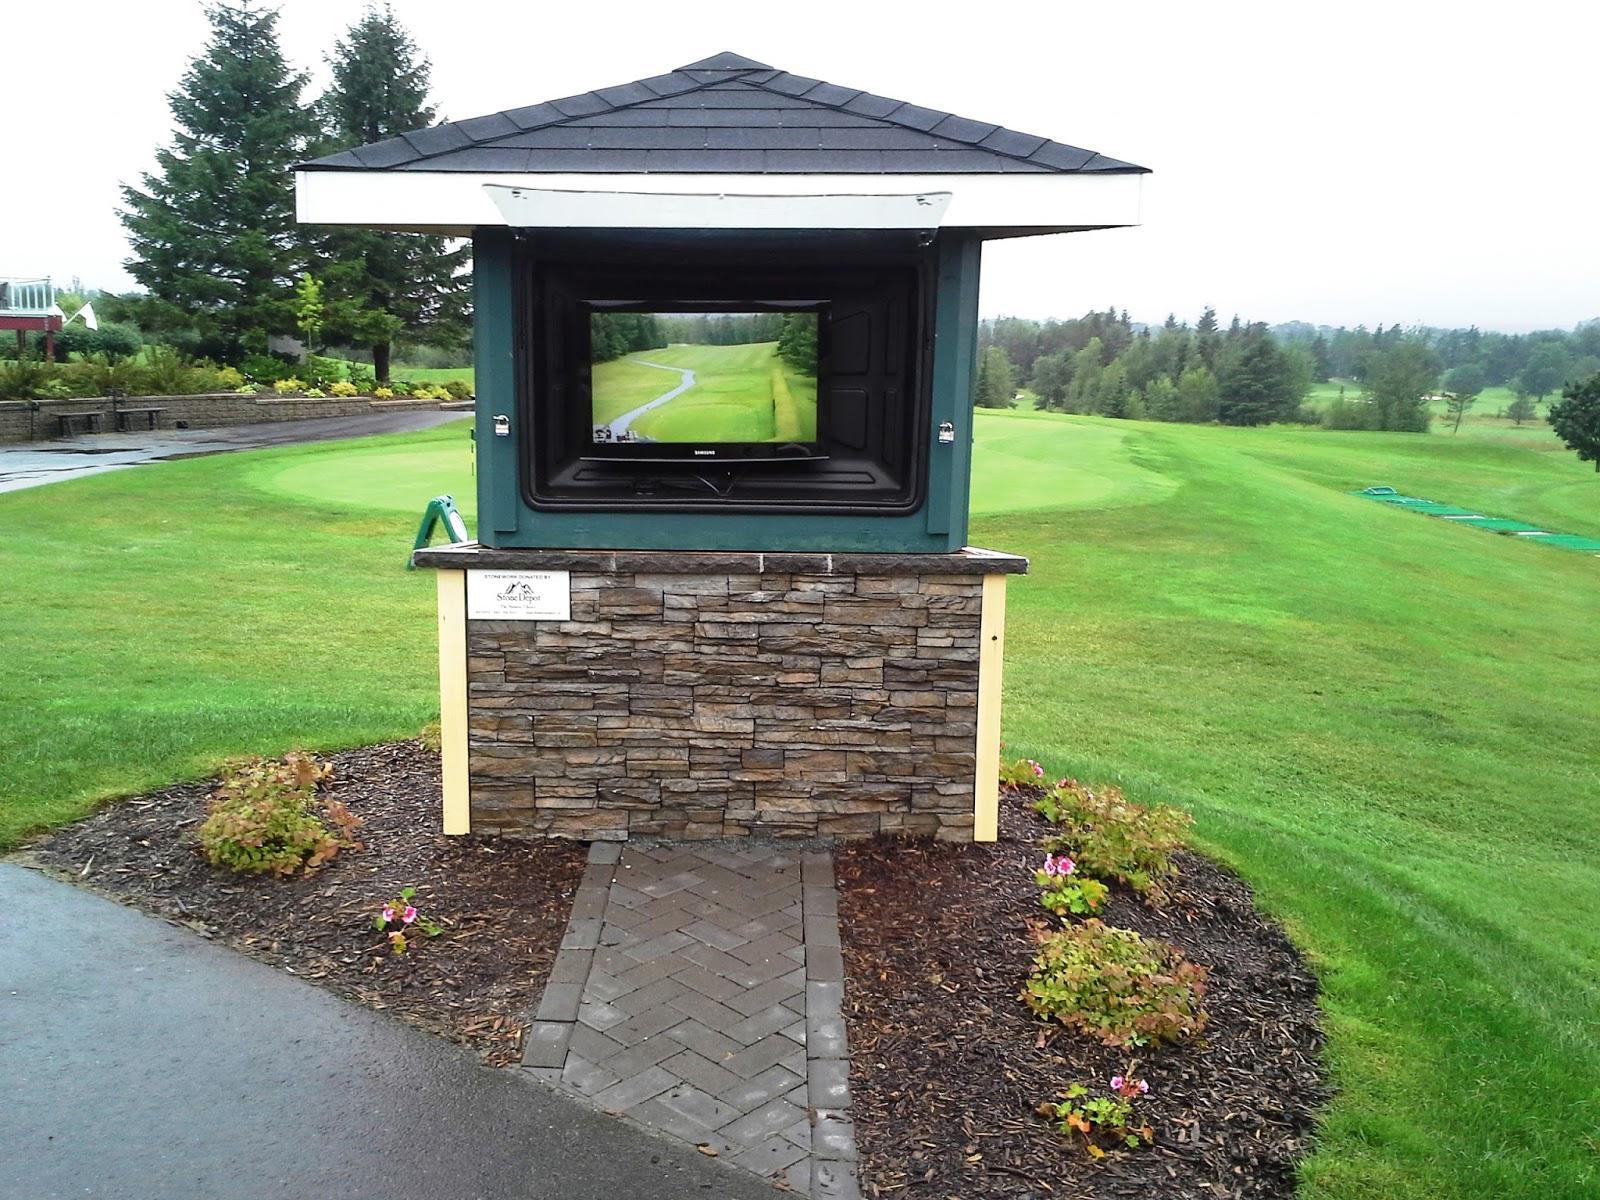 Why Weatherproof Tv Solutions Score Birdies For Golf Club